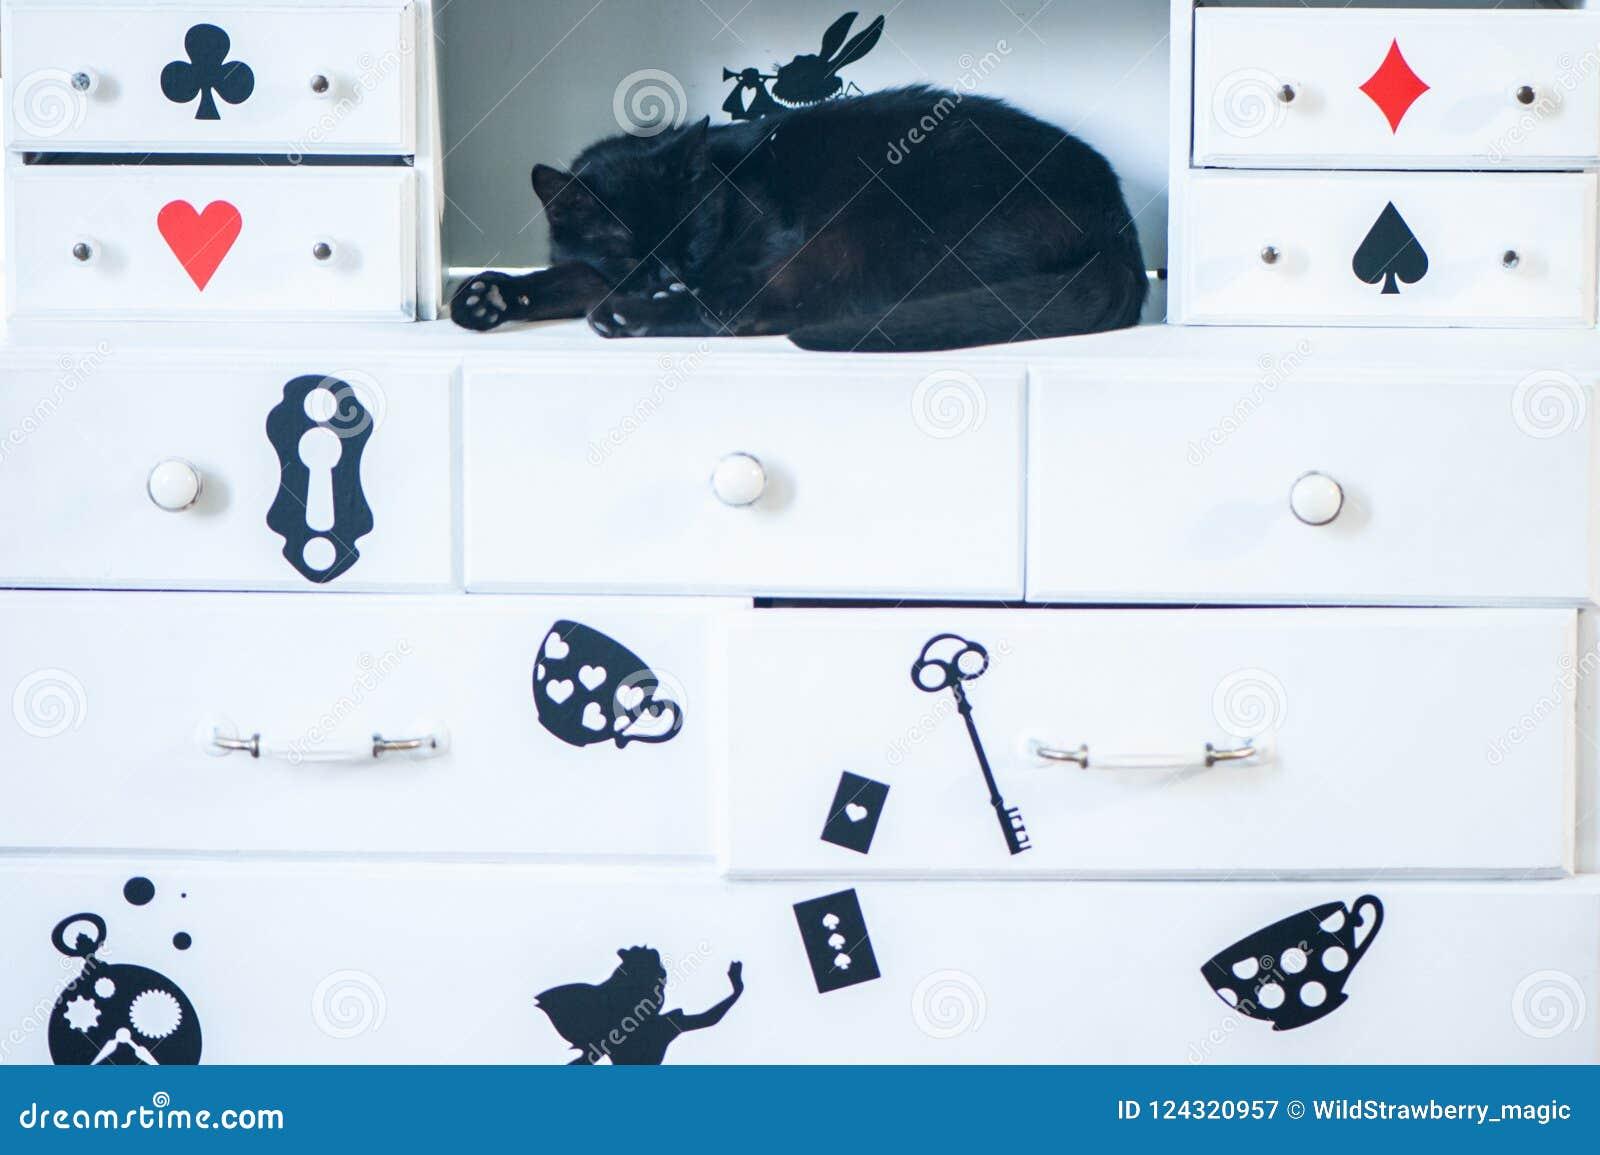 Fantastic black cat sleep, theme of Alice in Wonderland